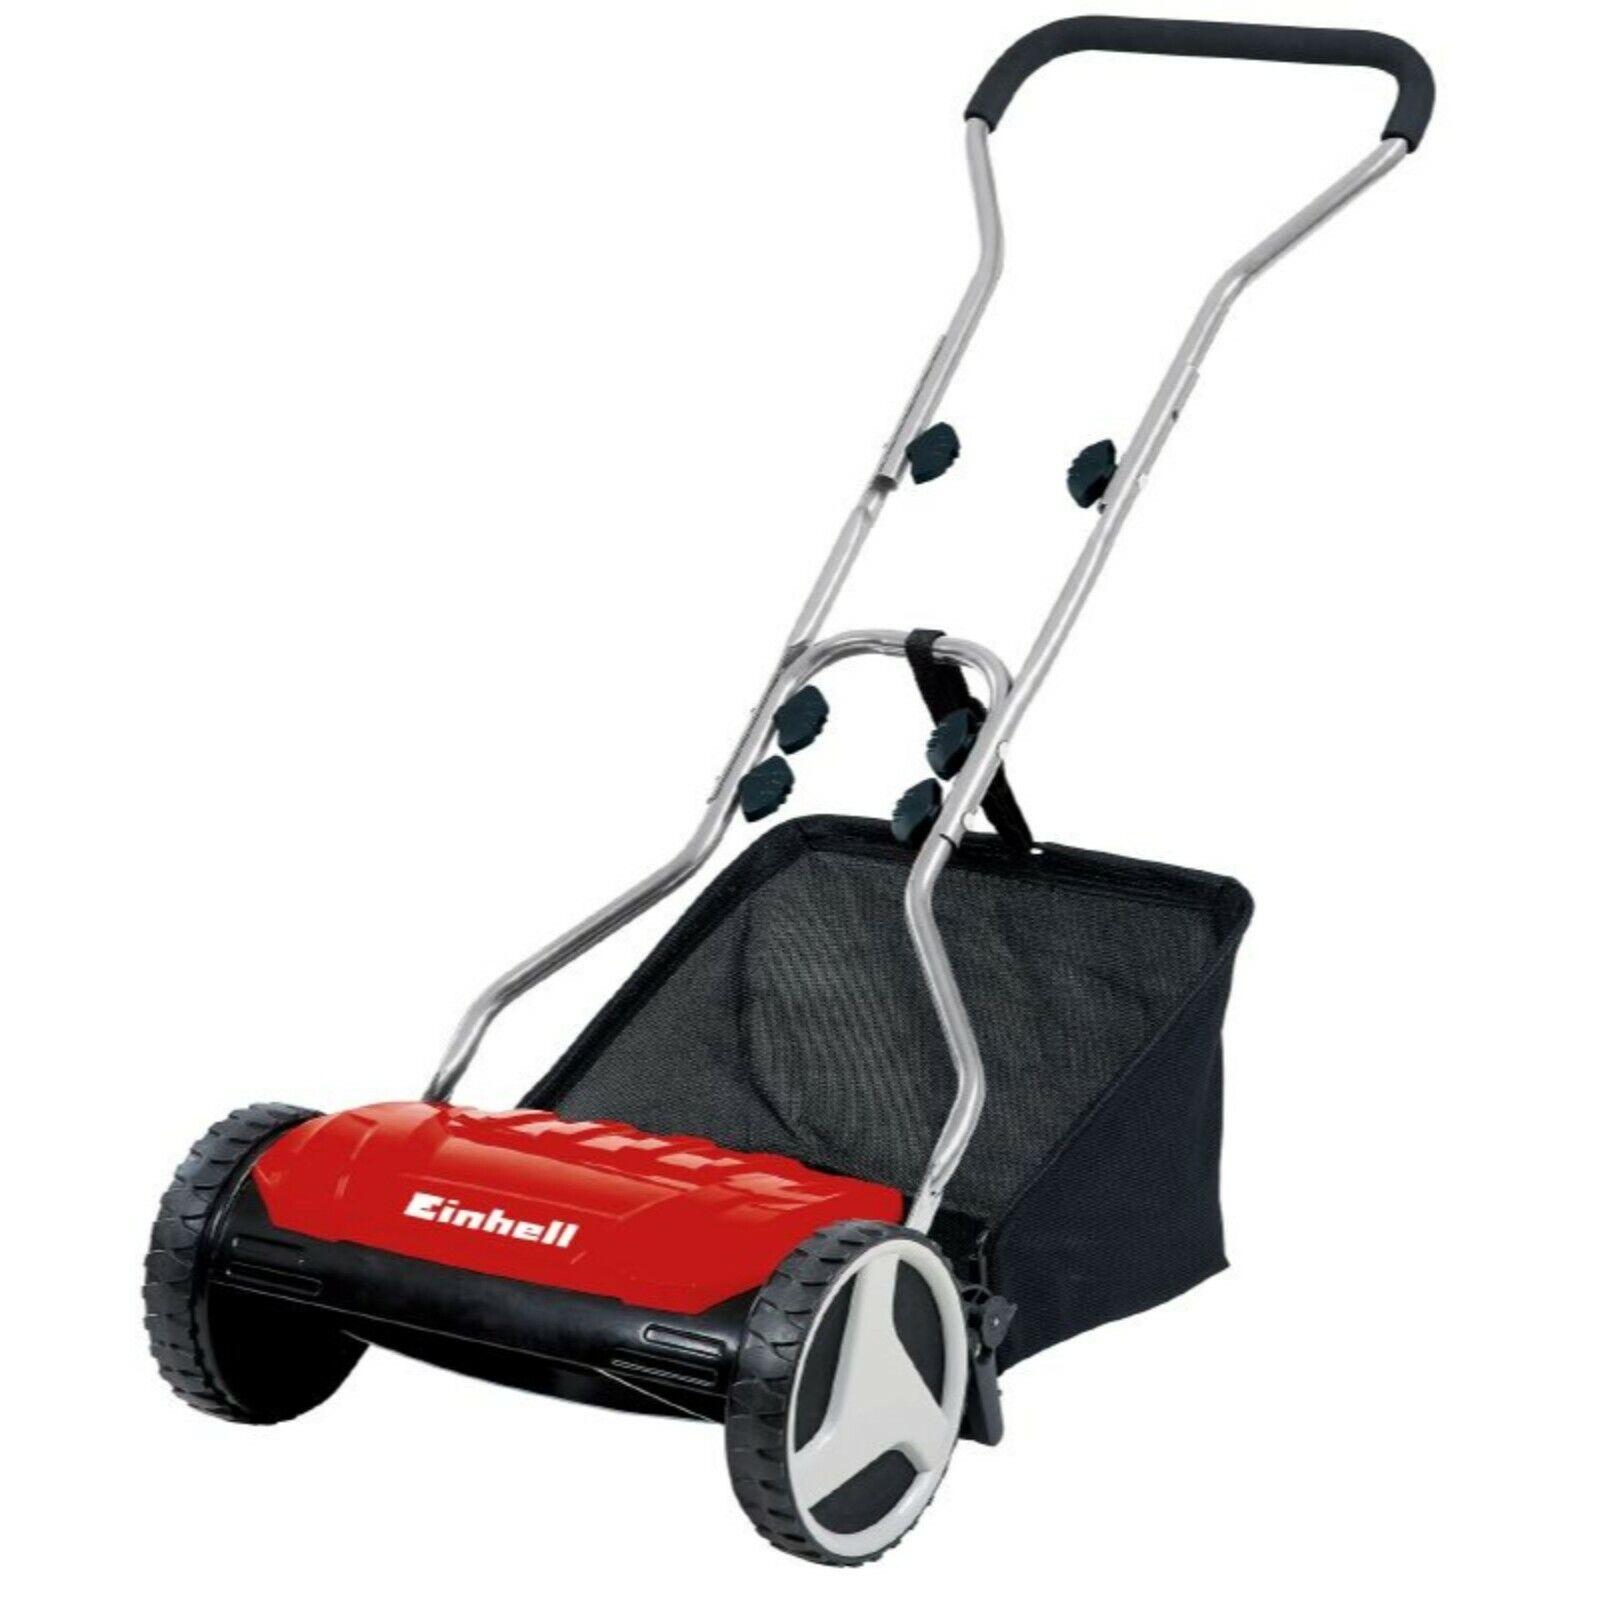 Einhell Manual Push Reel Lawn Mower